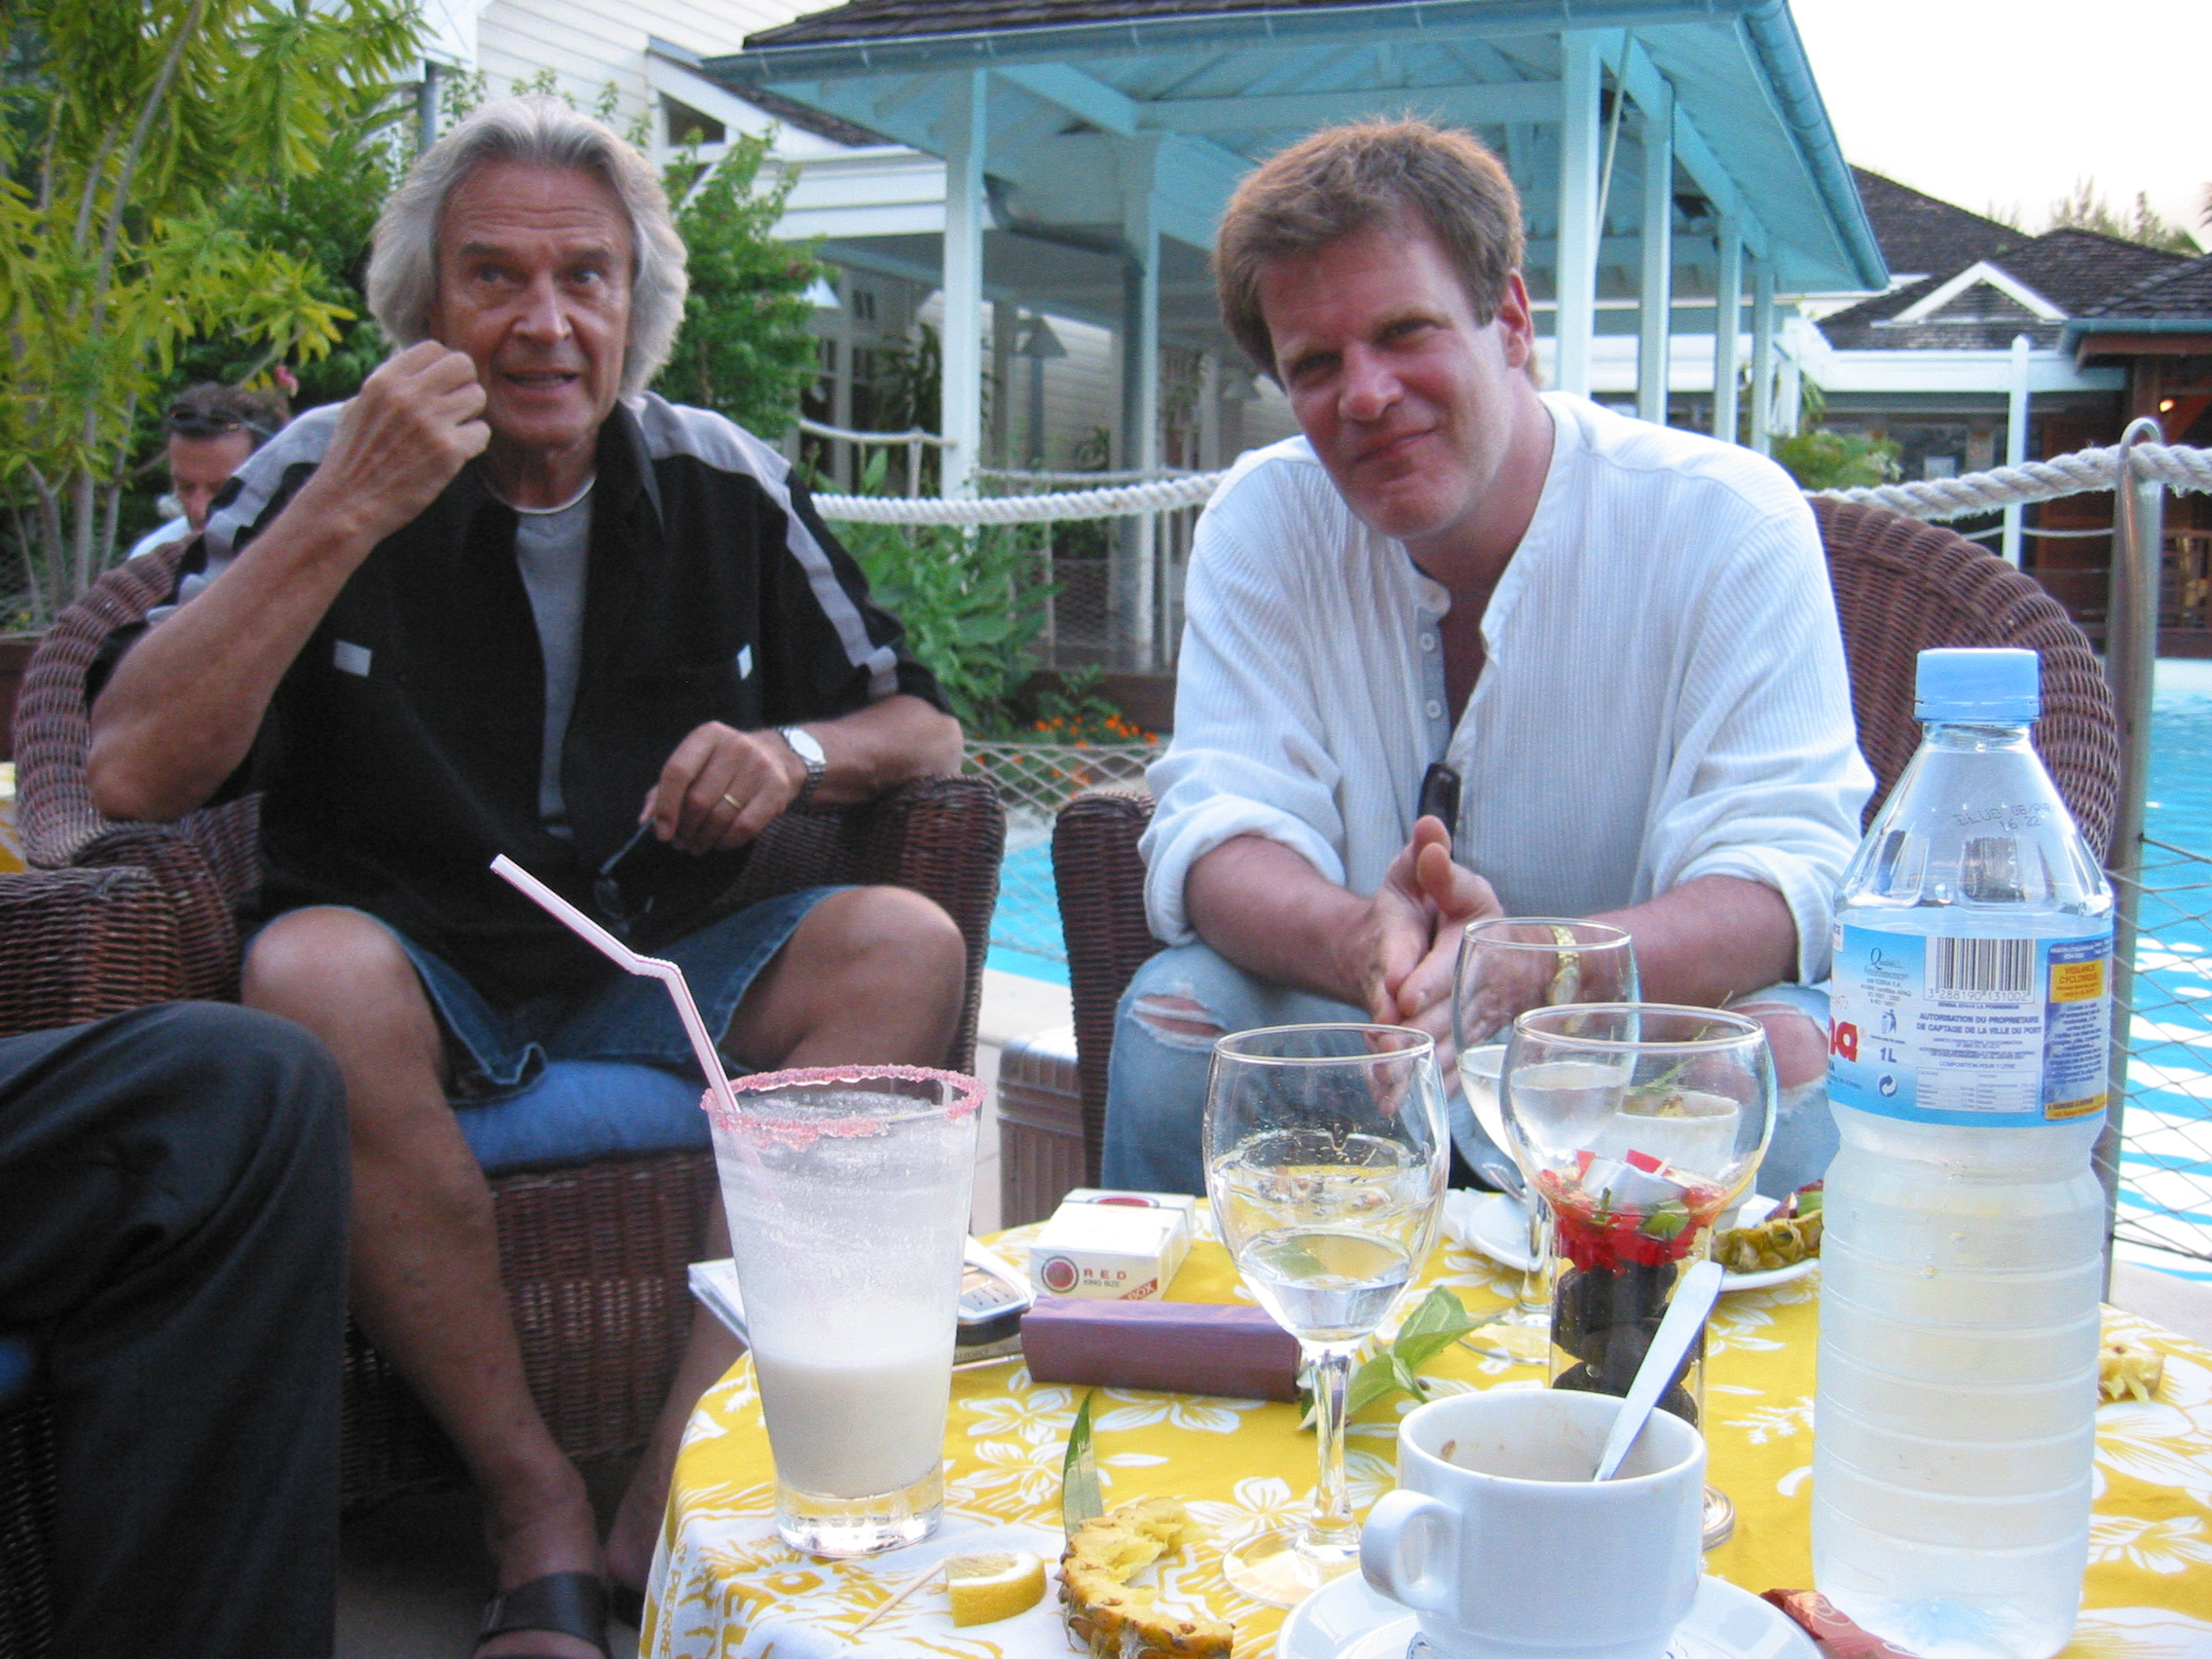 John mclaughlin & gary husband